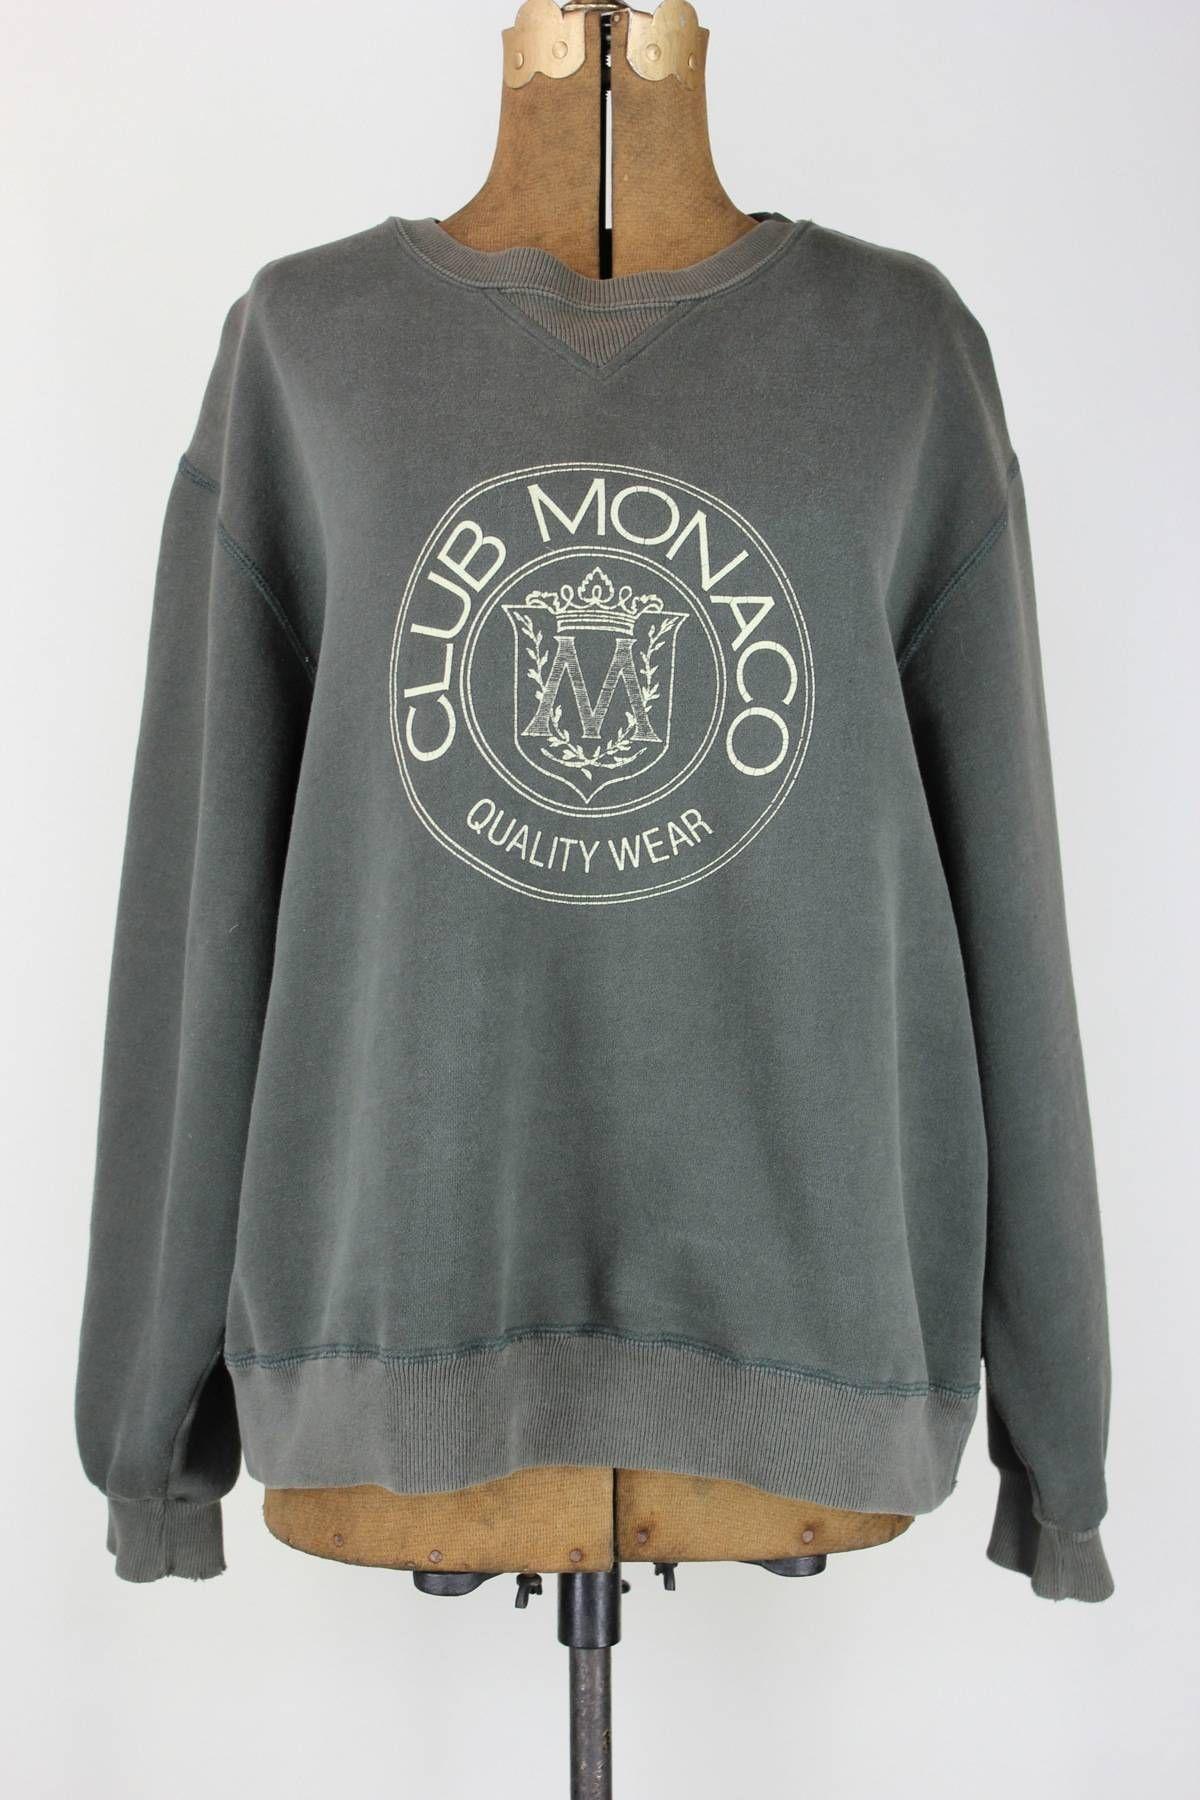 Club Monaco Vintage Sweatshirt, size L   Sweatshirts